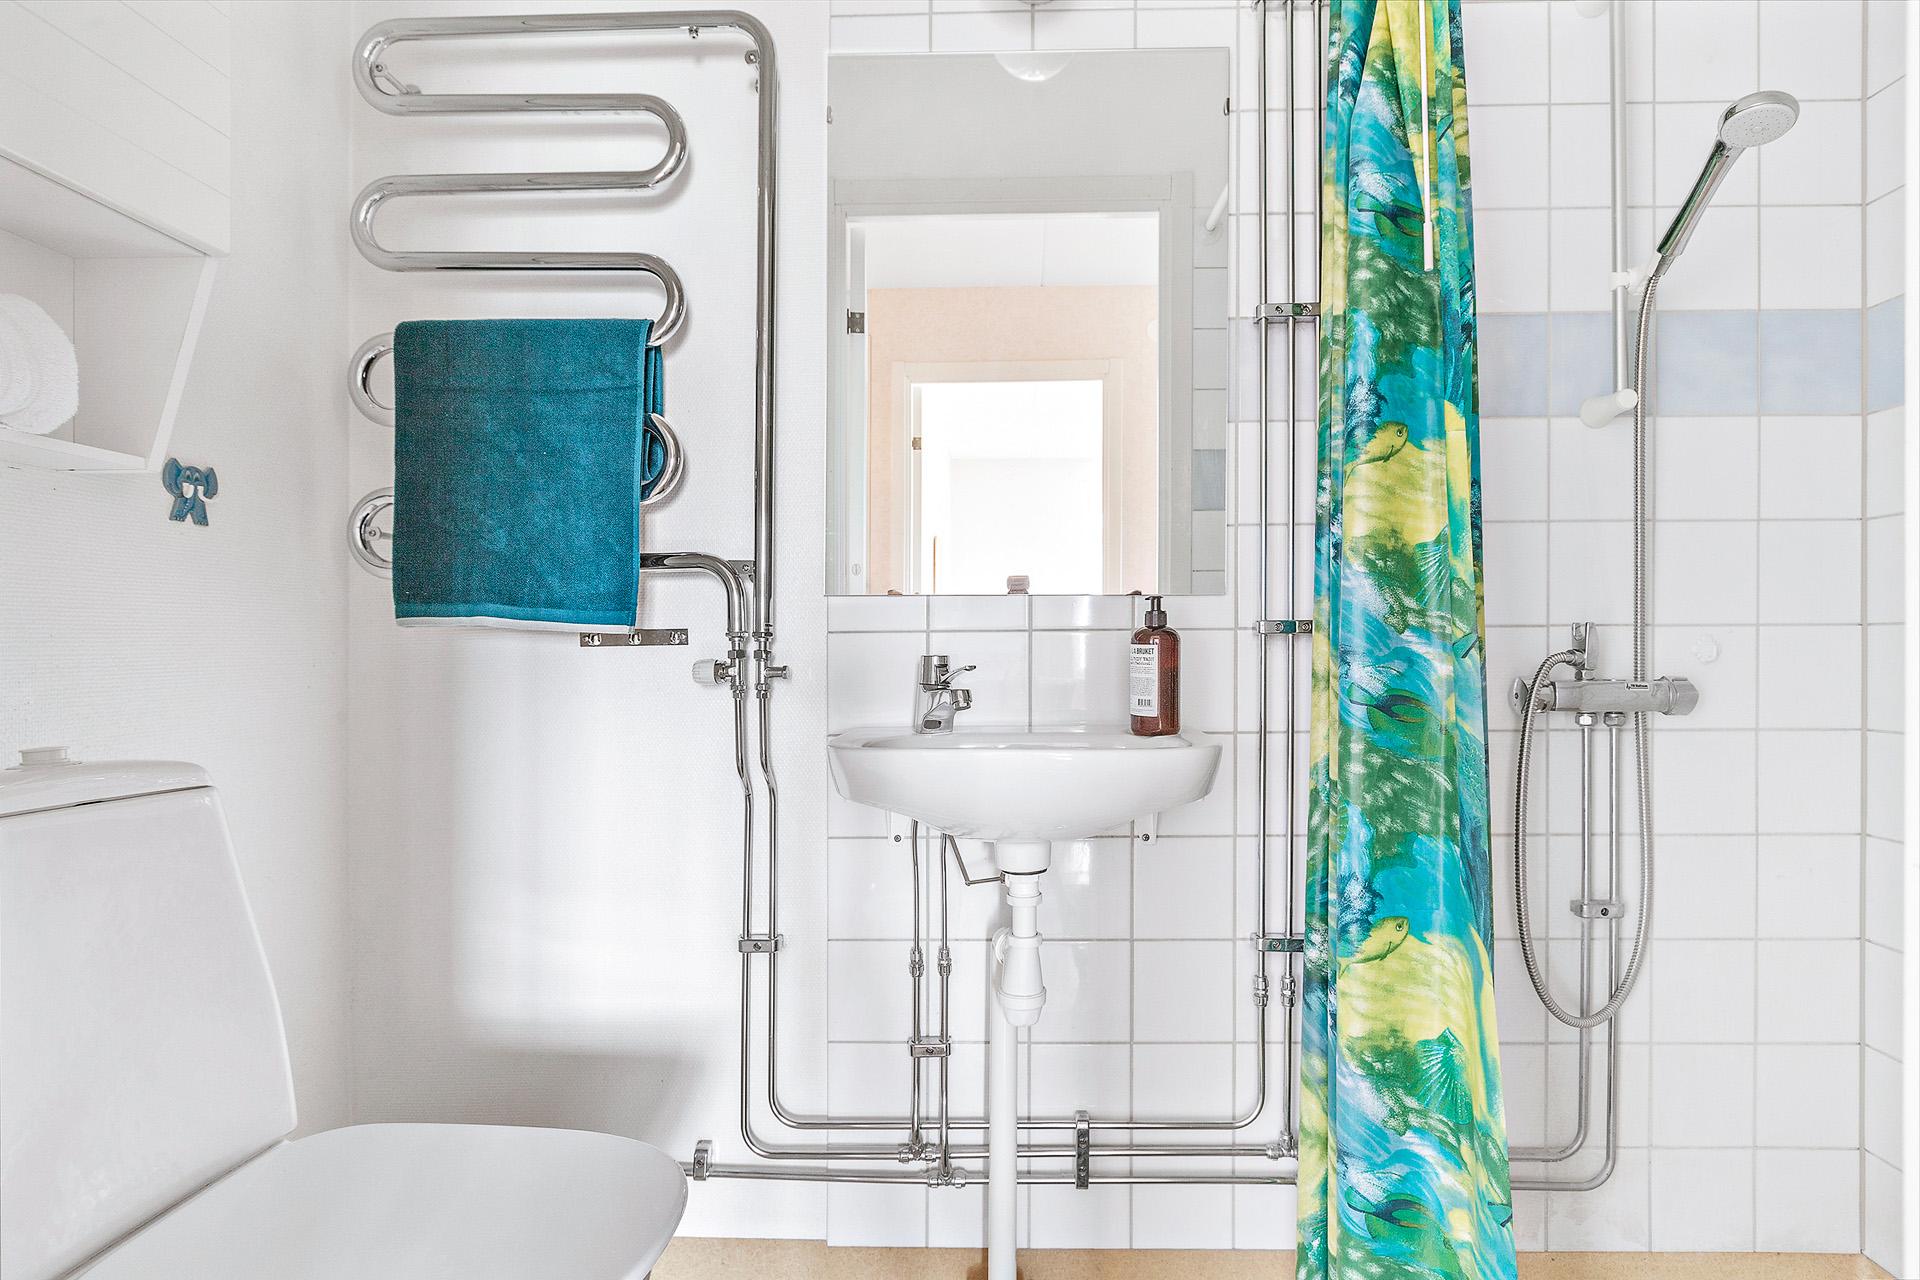 Duschrum med handduksvärmare.